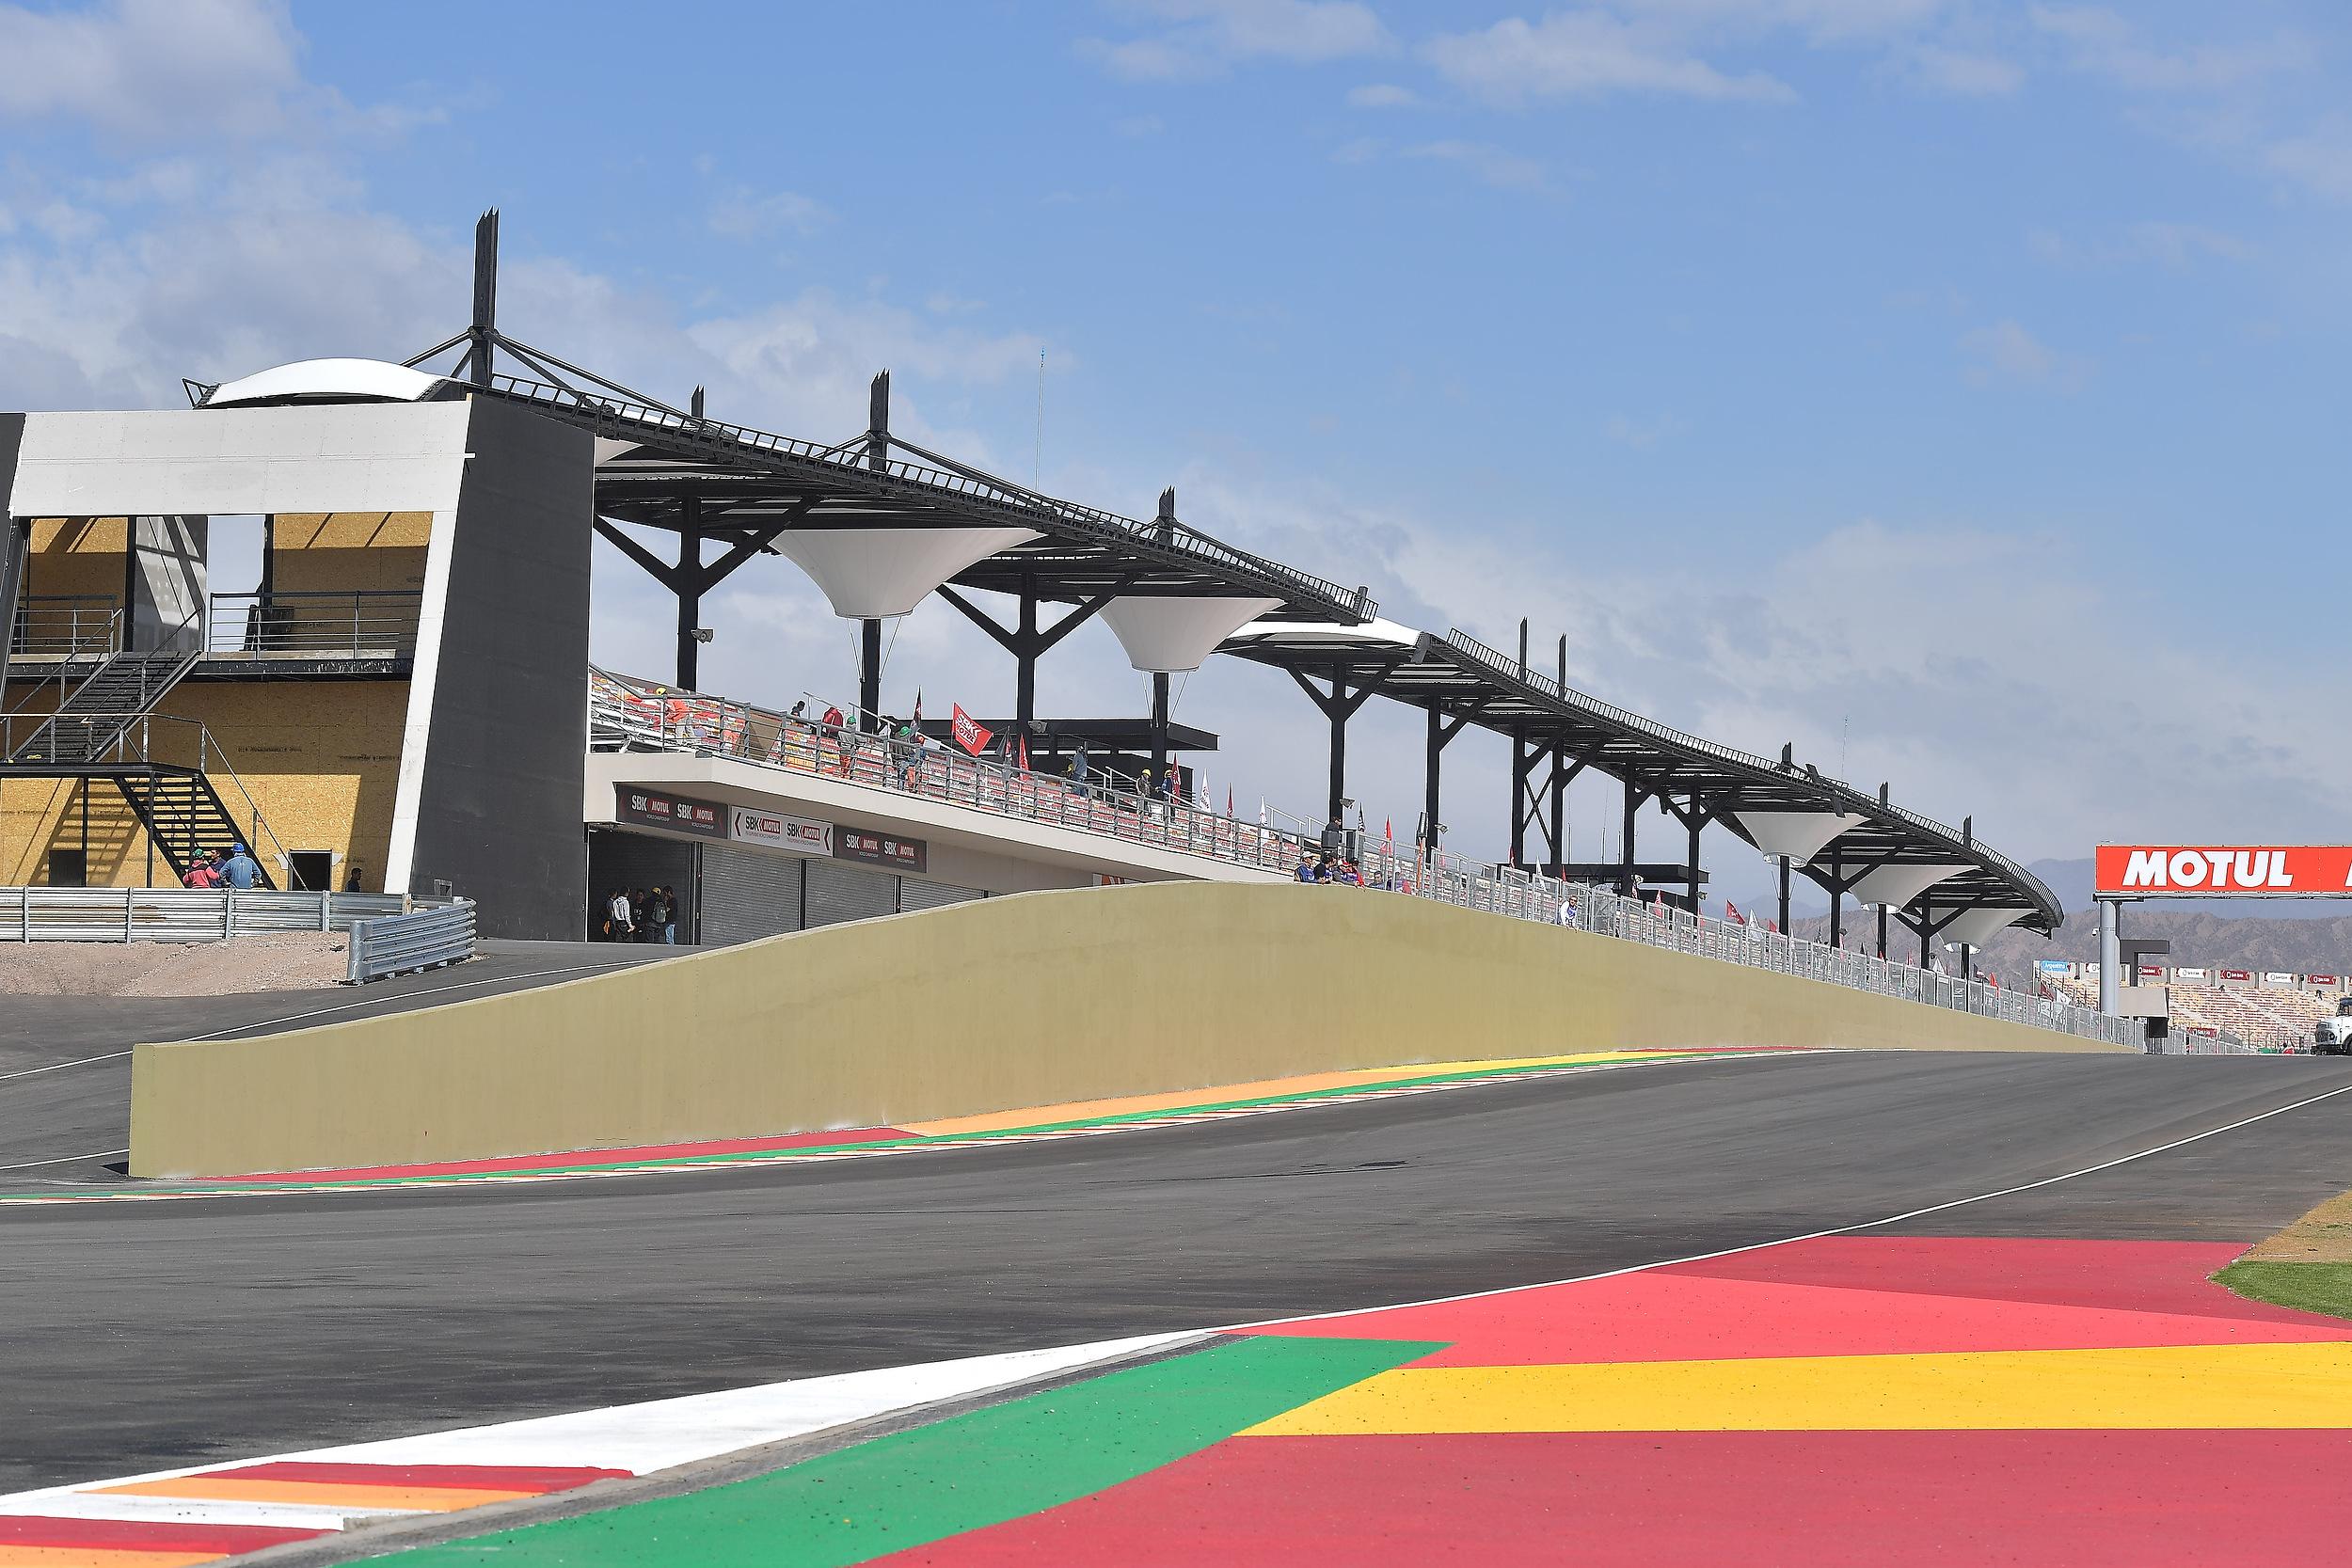 FIM スーパーバイク世界選手権(SBK) 2021年よりロングラップペナルティーを導入